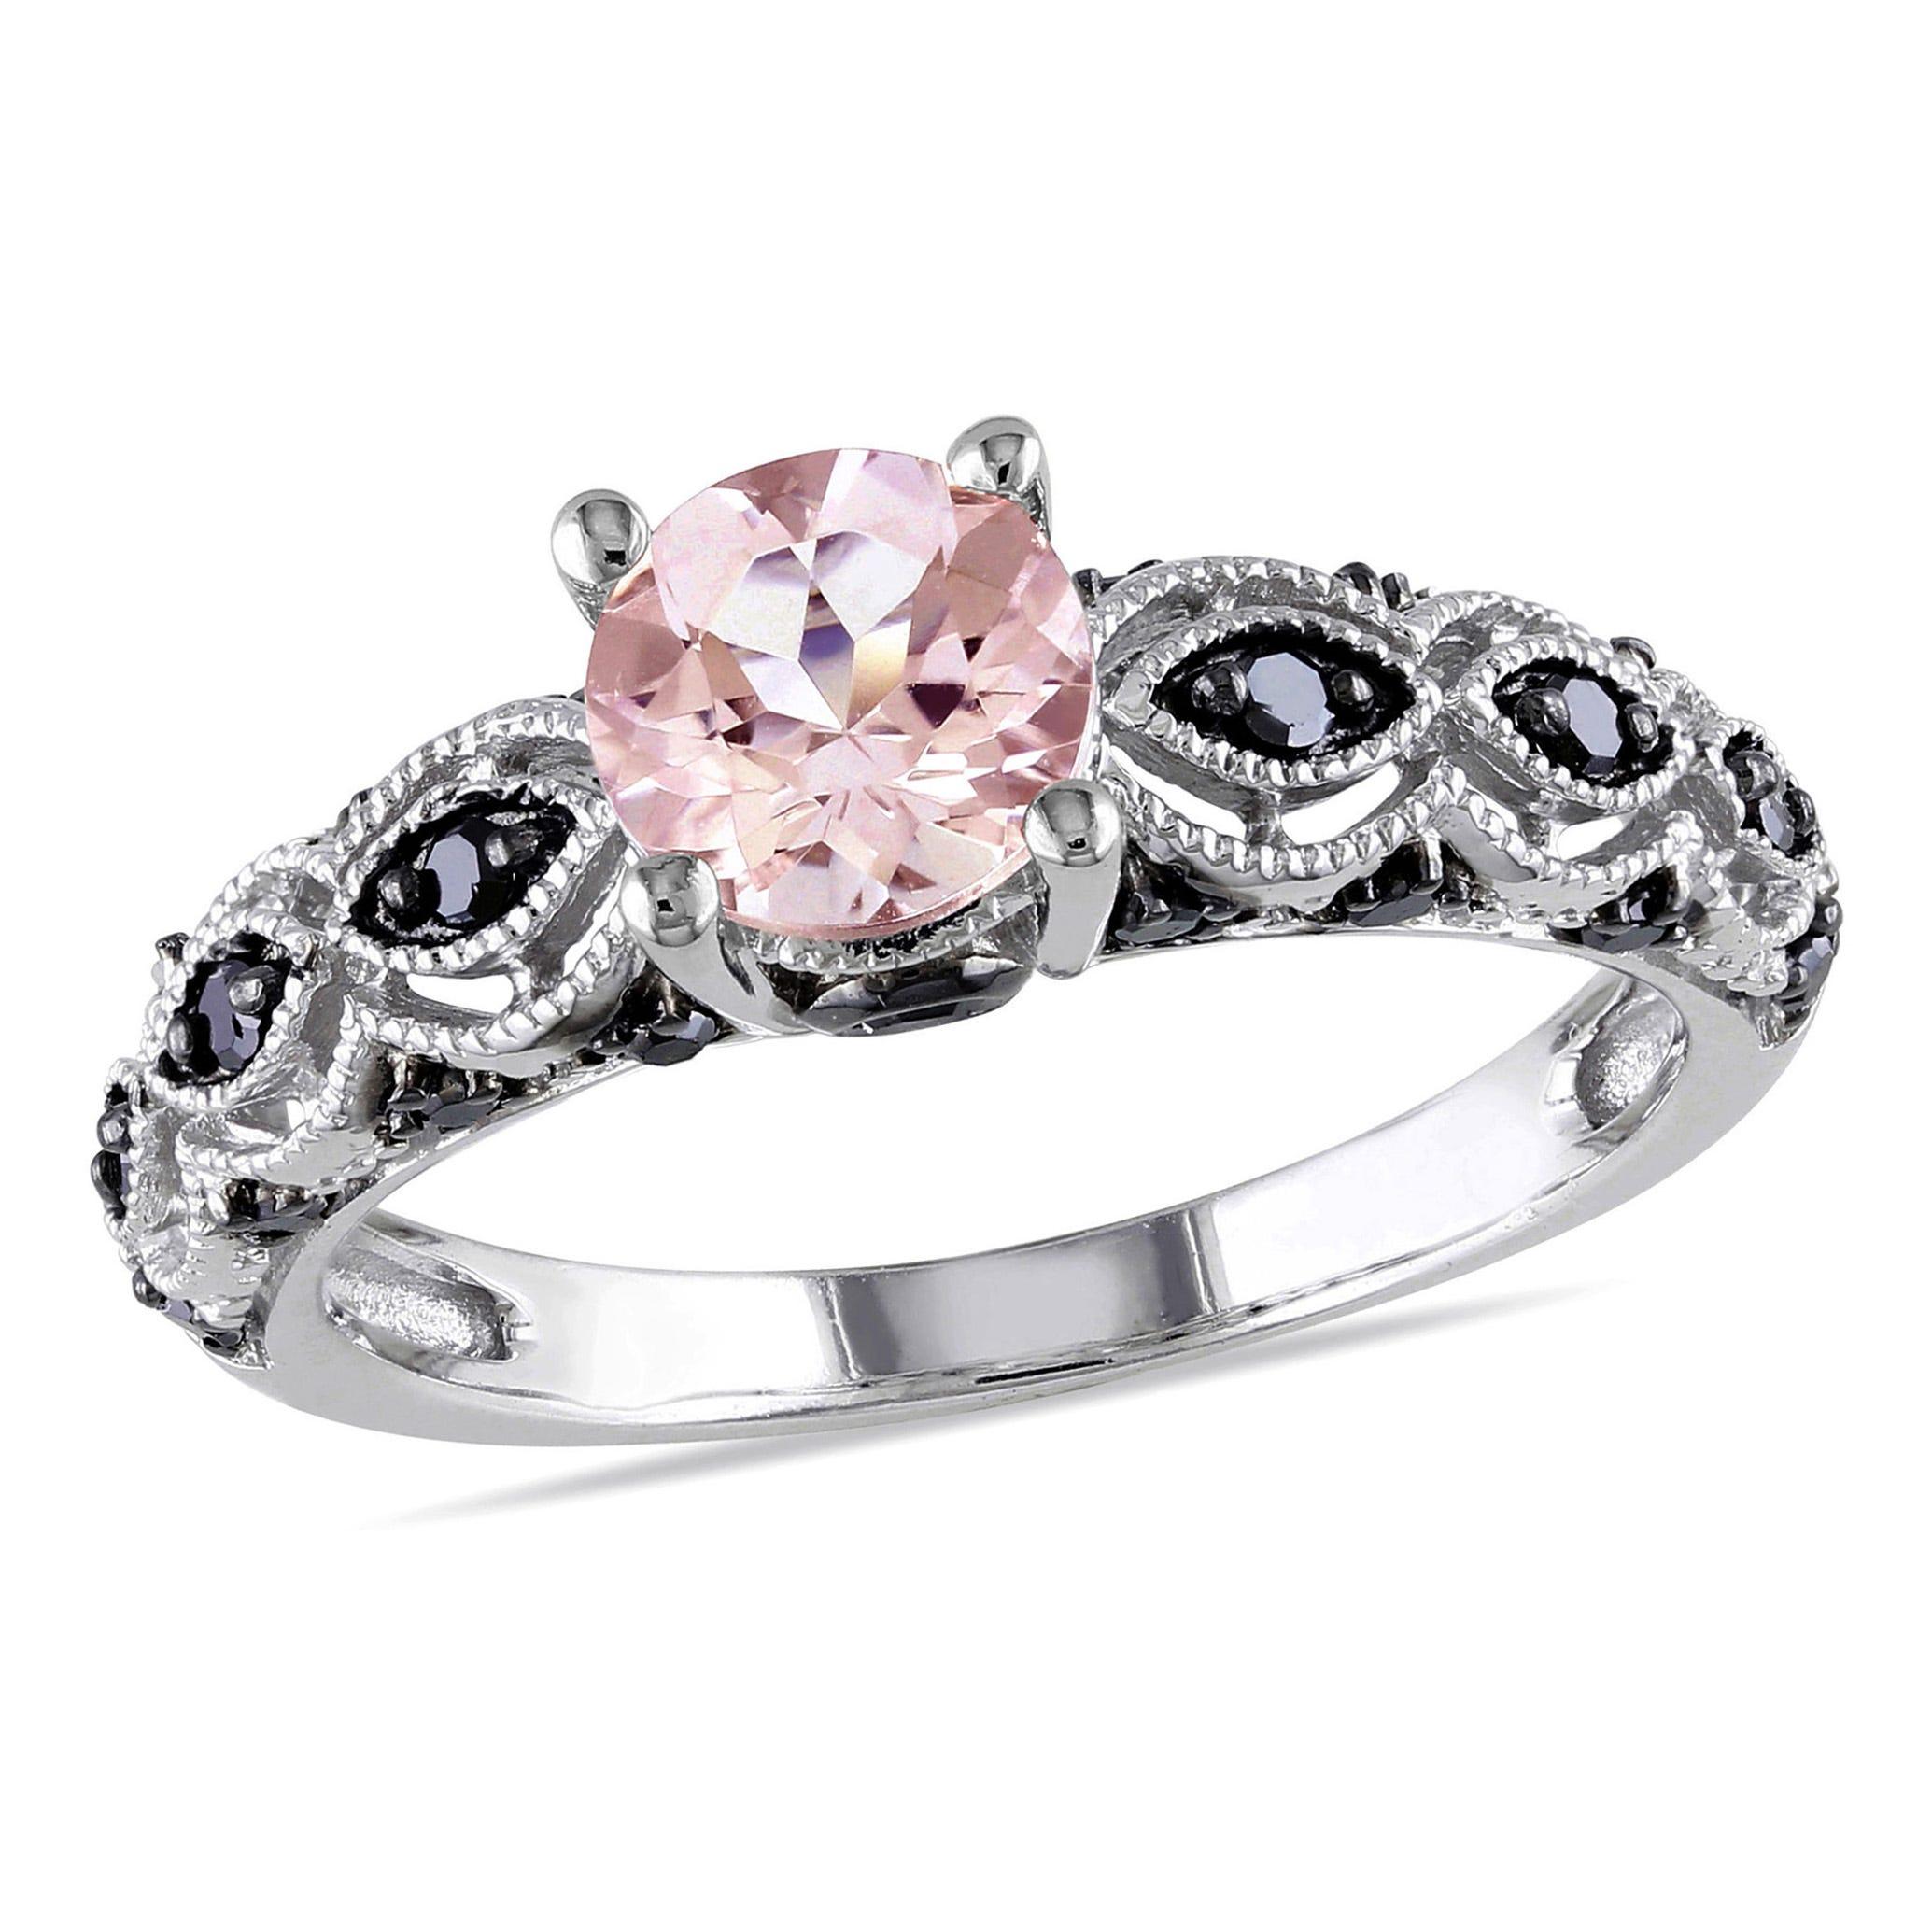 Round Cut Morganite and Black Diamond Ring in 10k White Gold